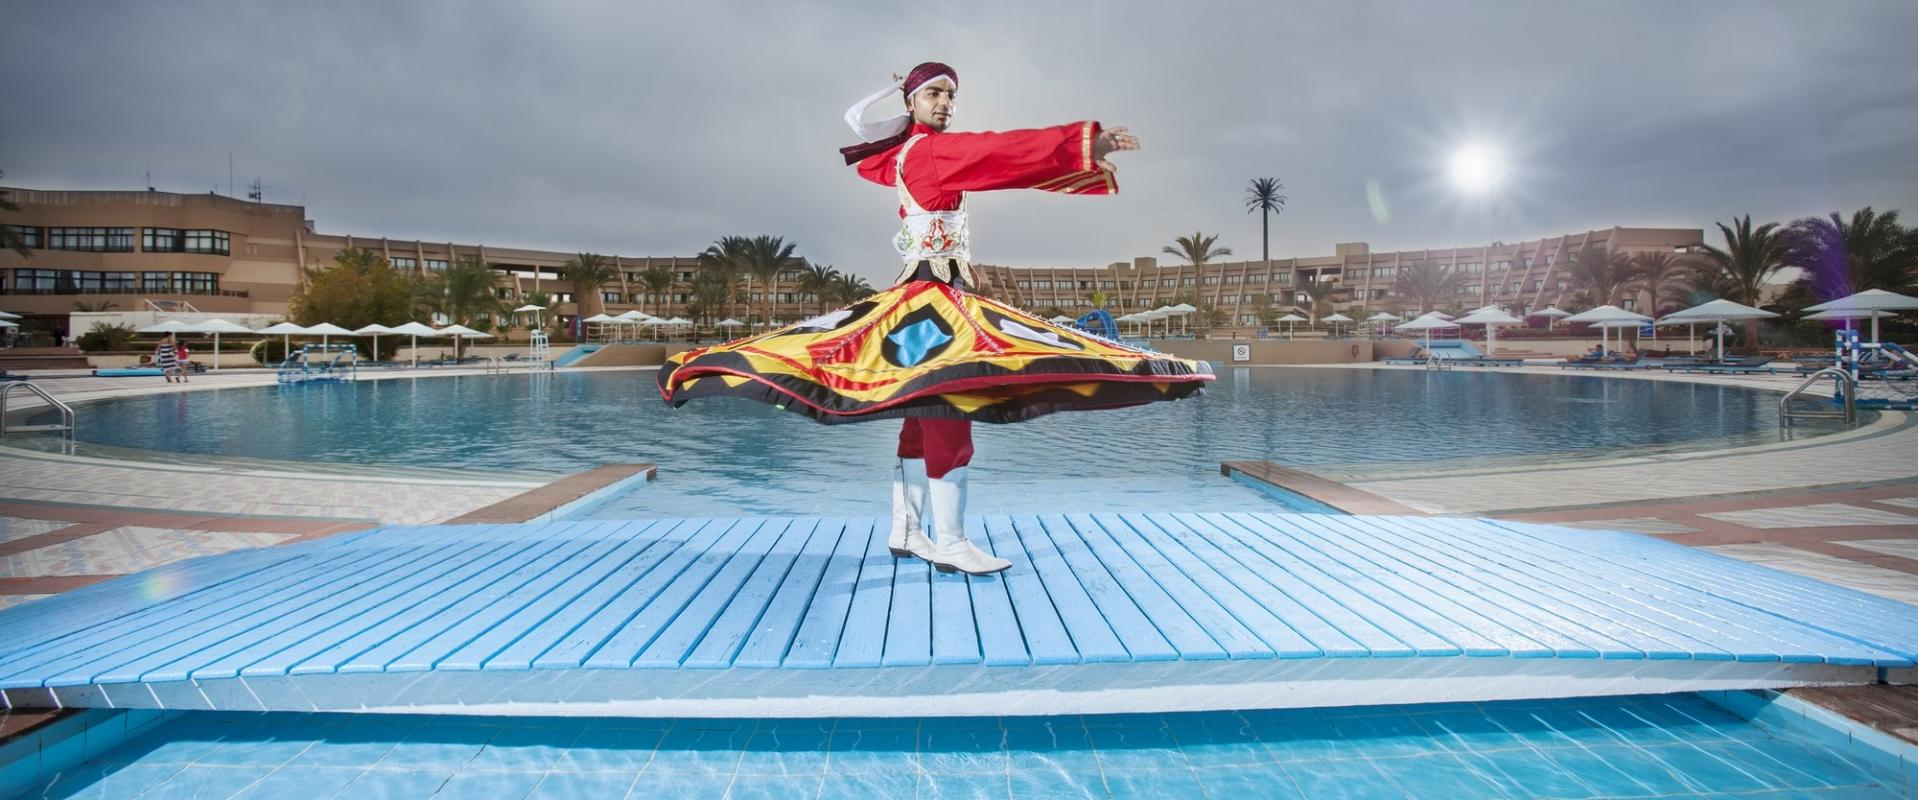 http://egypte.croisiere.voyage/wp-content/uploads/2016/11/HRG-SH-Hurghada-Resort-Entertainment-Tanoura-Dancer.jpg